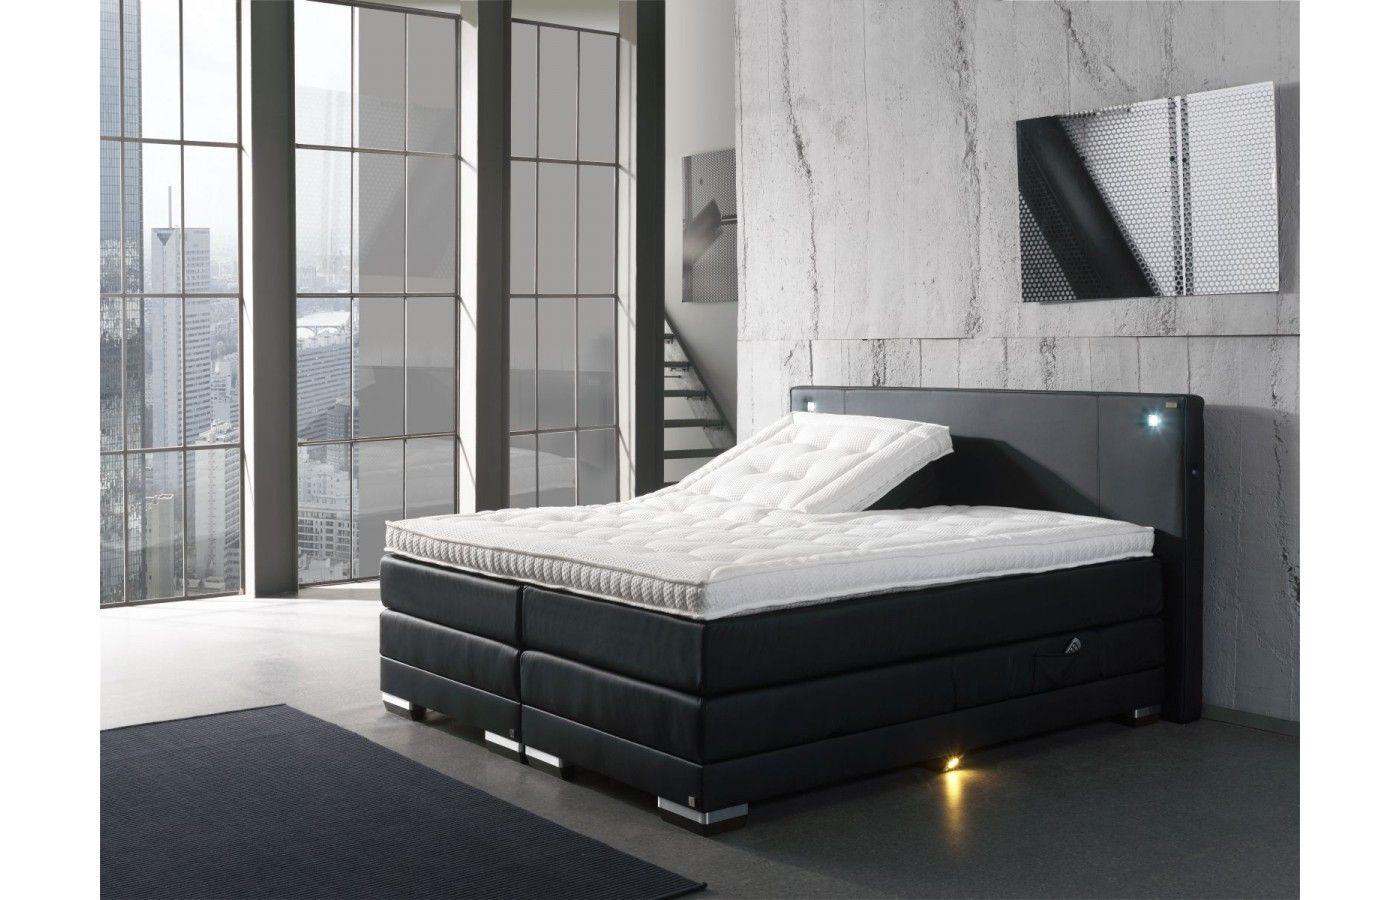 Inspirational  Design Boxspring Bett mit rundum LED Beleuchtung Exklusiv auf Sofas